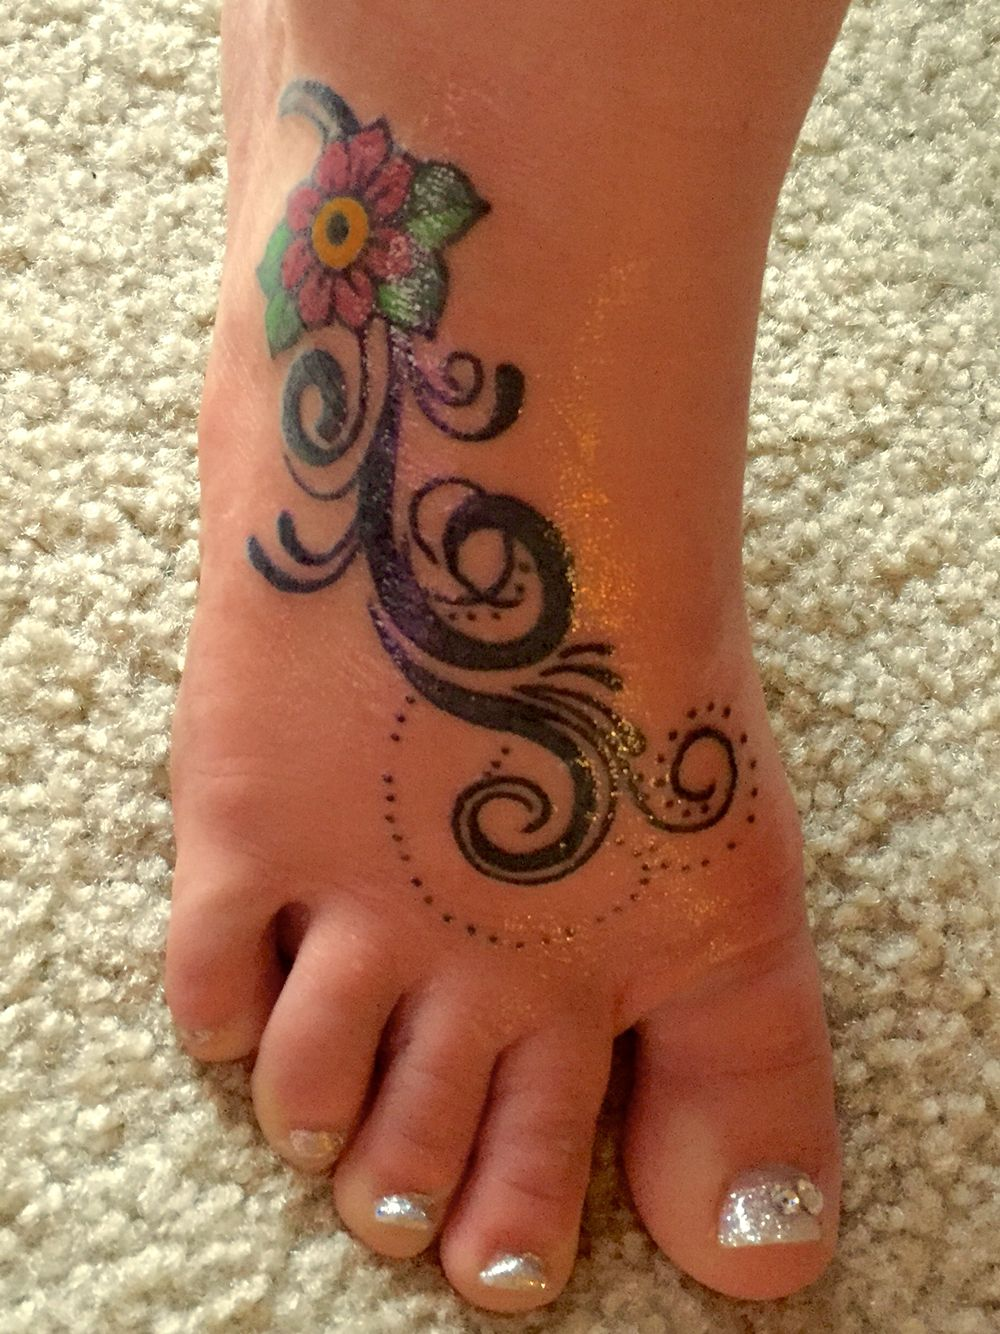 My new stunning and glamorous custom foot tattoo tattoo designs